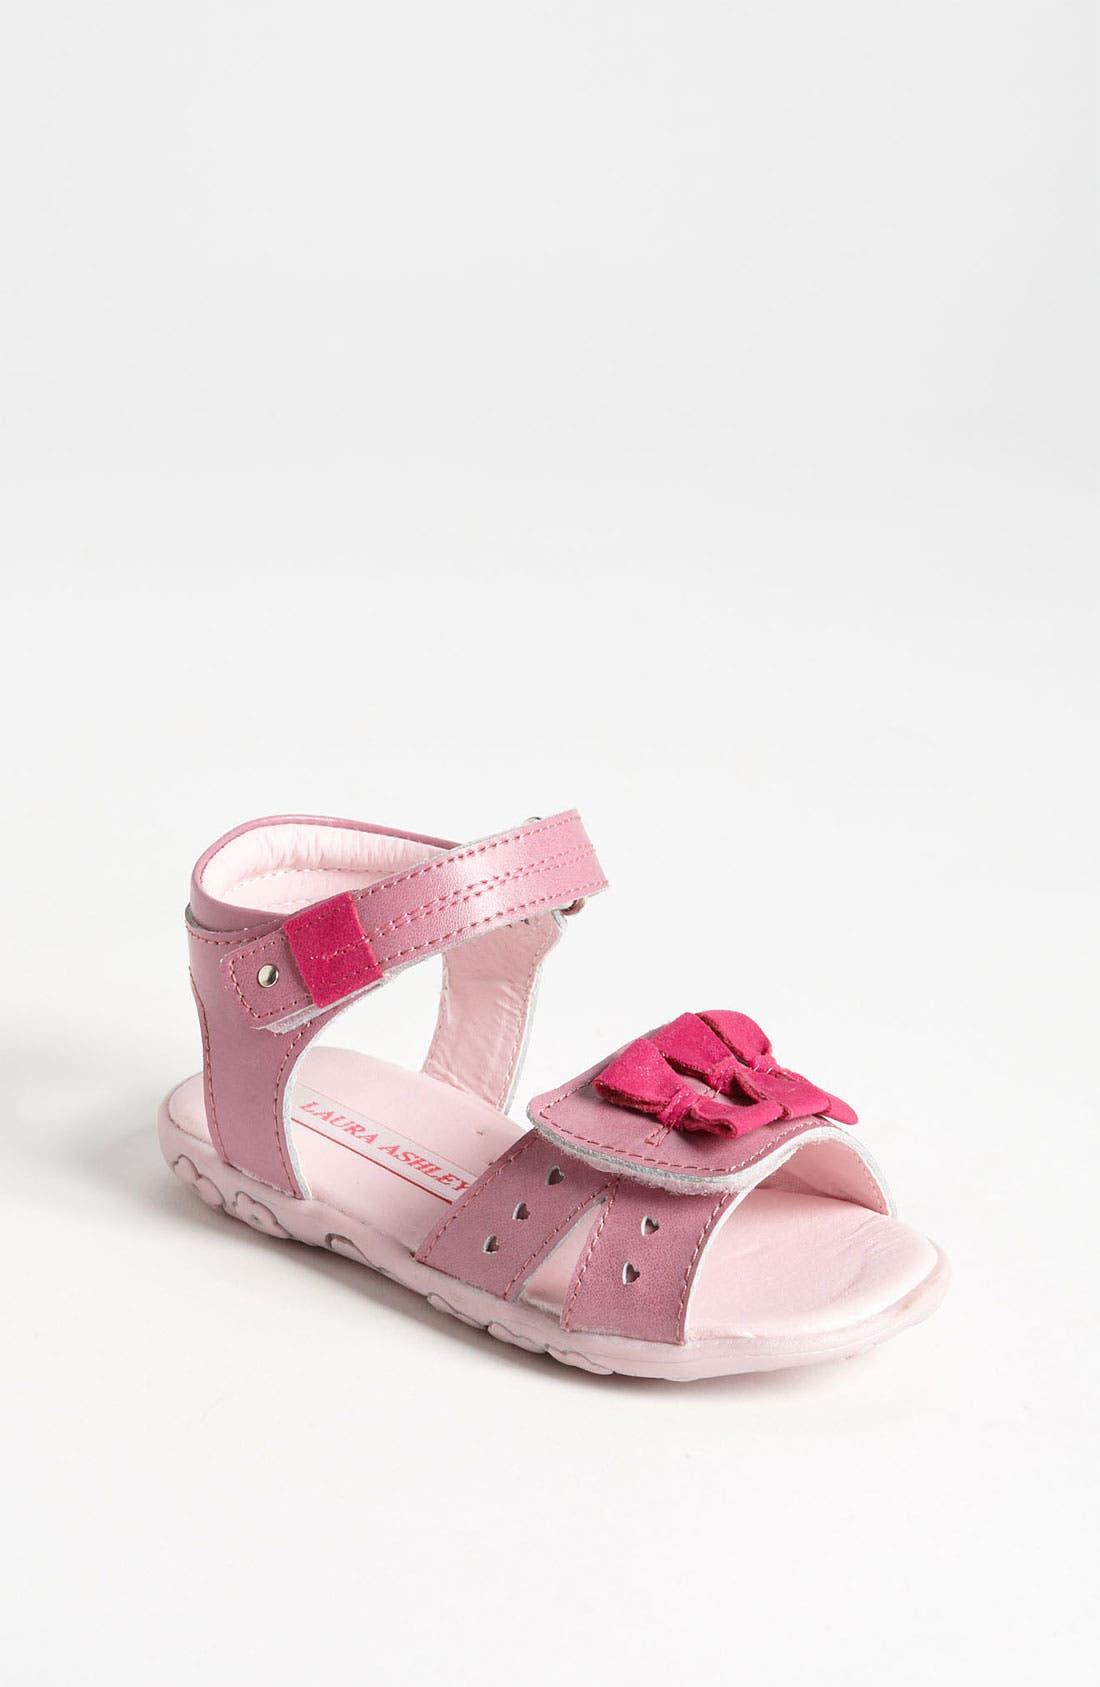 Alternate Image 1 Selected - Laura Ashley 'Bow' Sandal (Walker & Toddler)